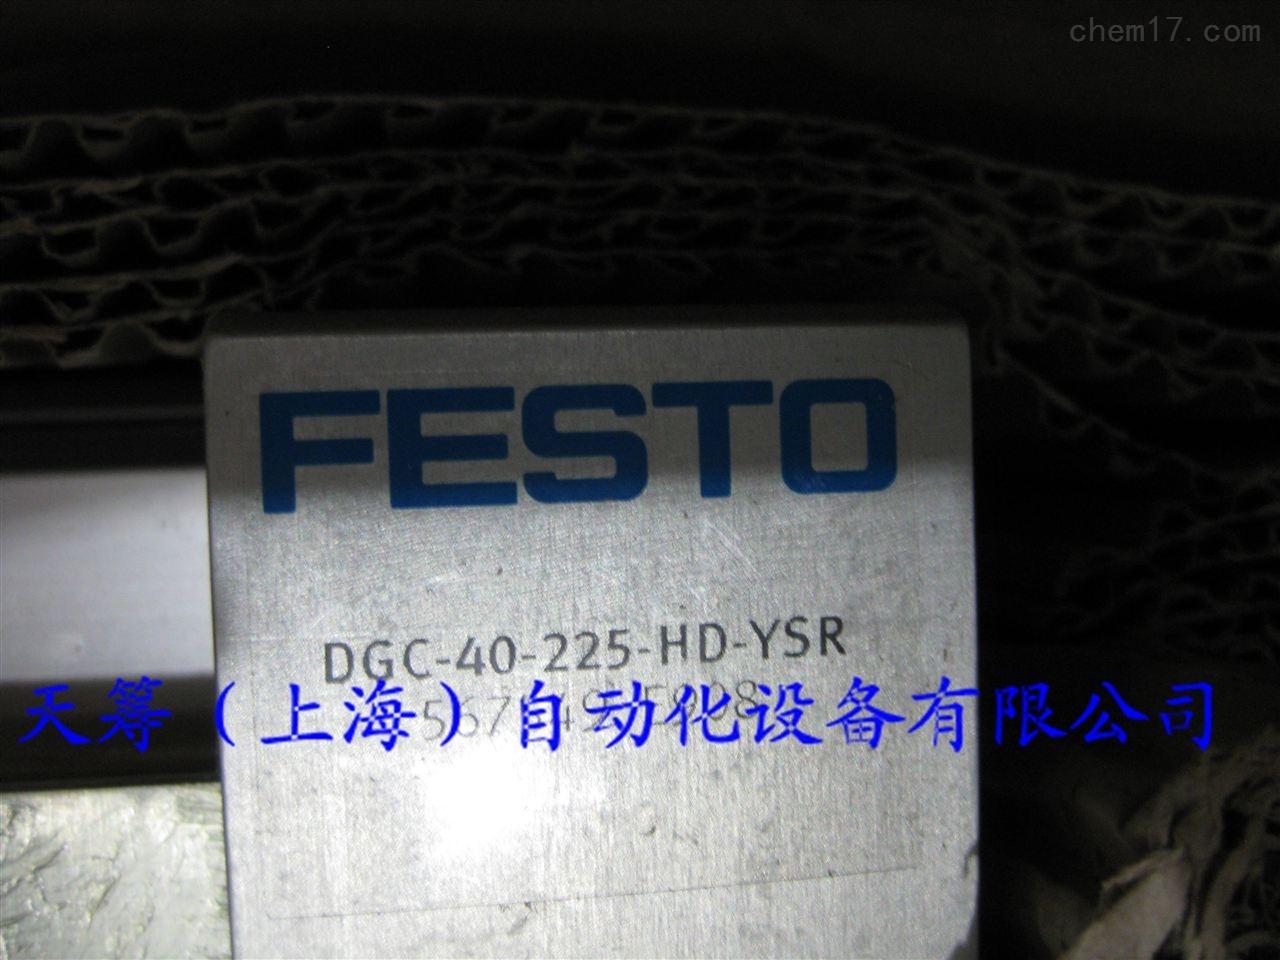 FESTO无杆气缸DGC-40-225-HD-YSR